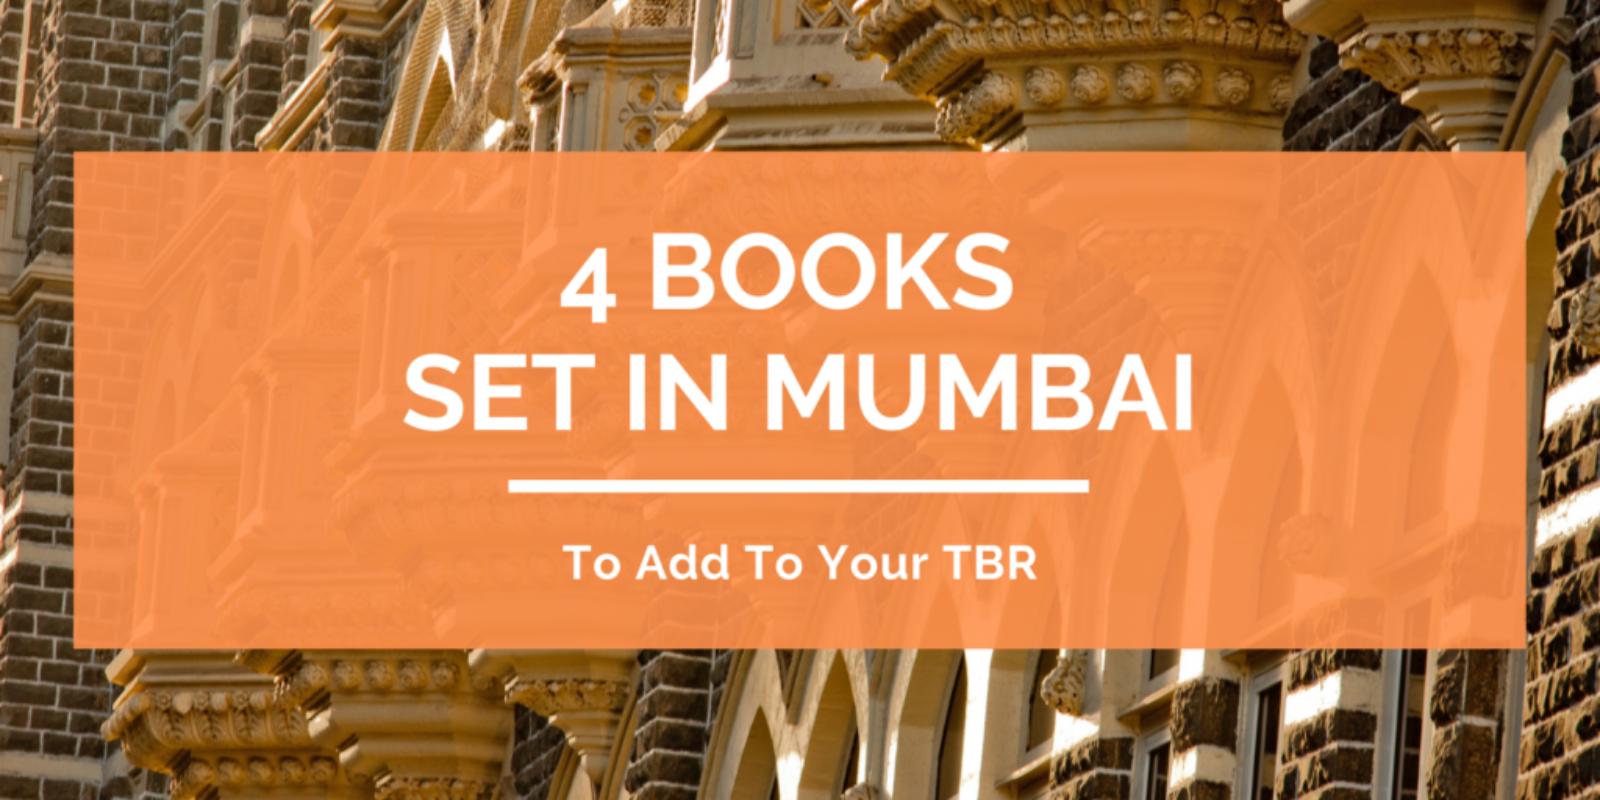 4-Books-Set-In-Mumbai